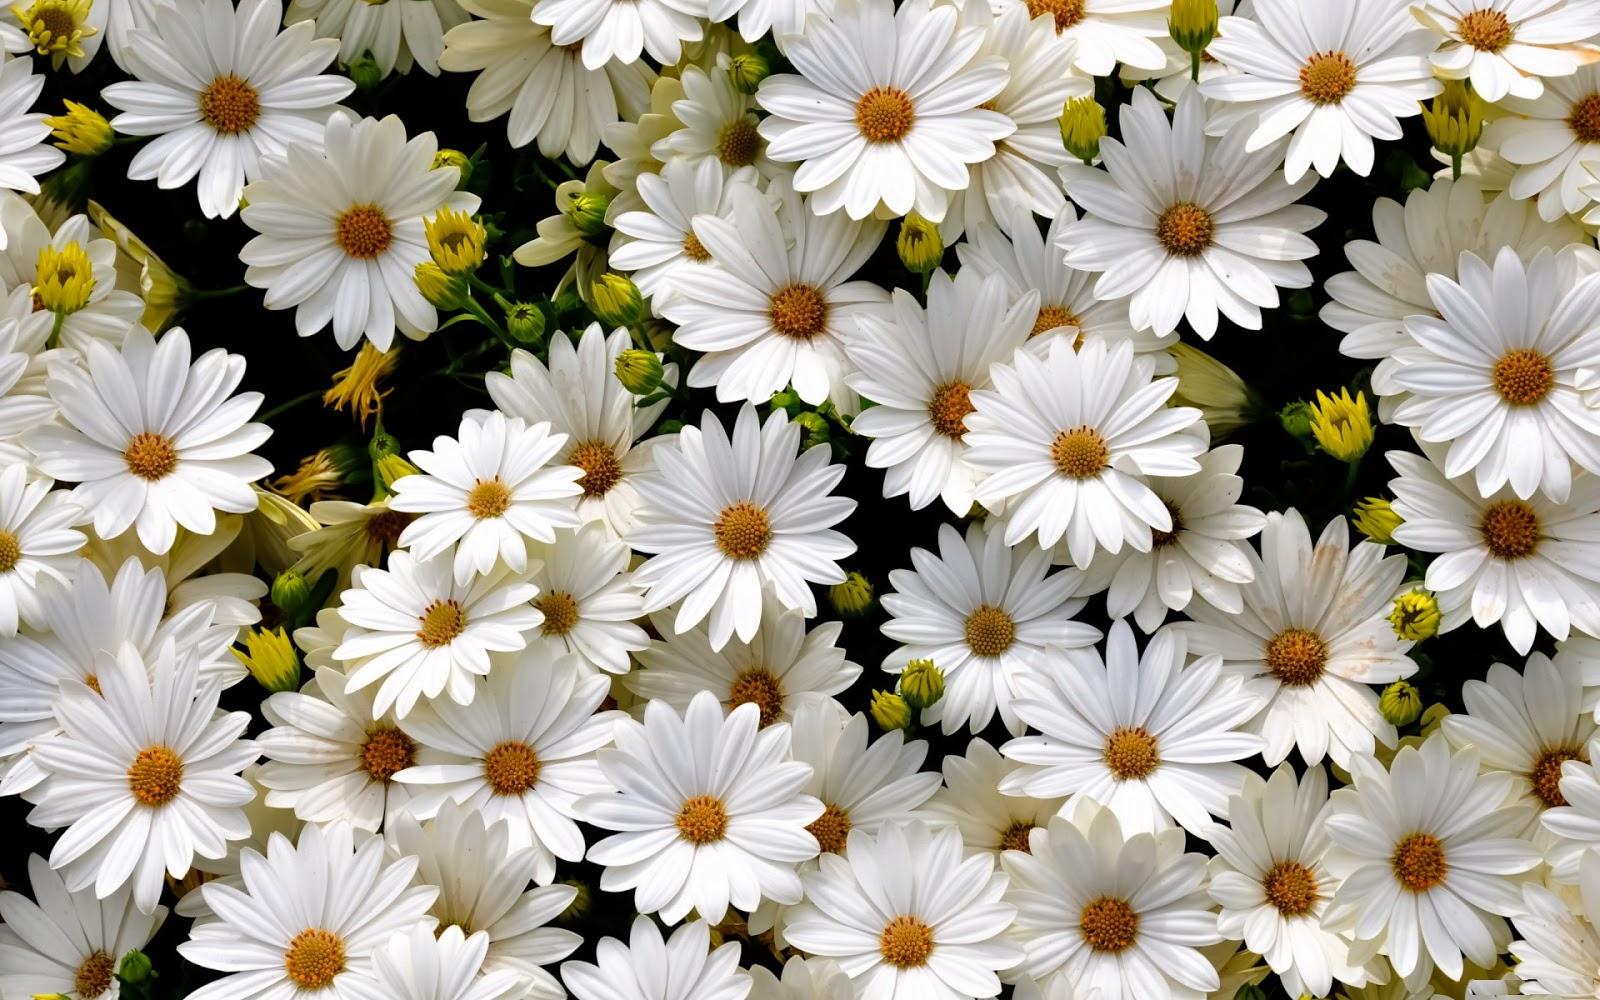 many white daisy flowers arrangement jpg pure white daisy flower 1600x1000